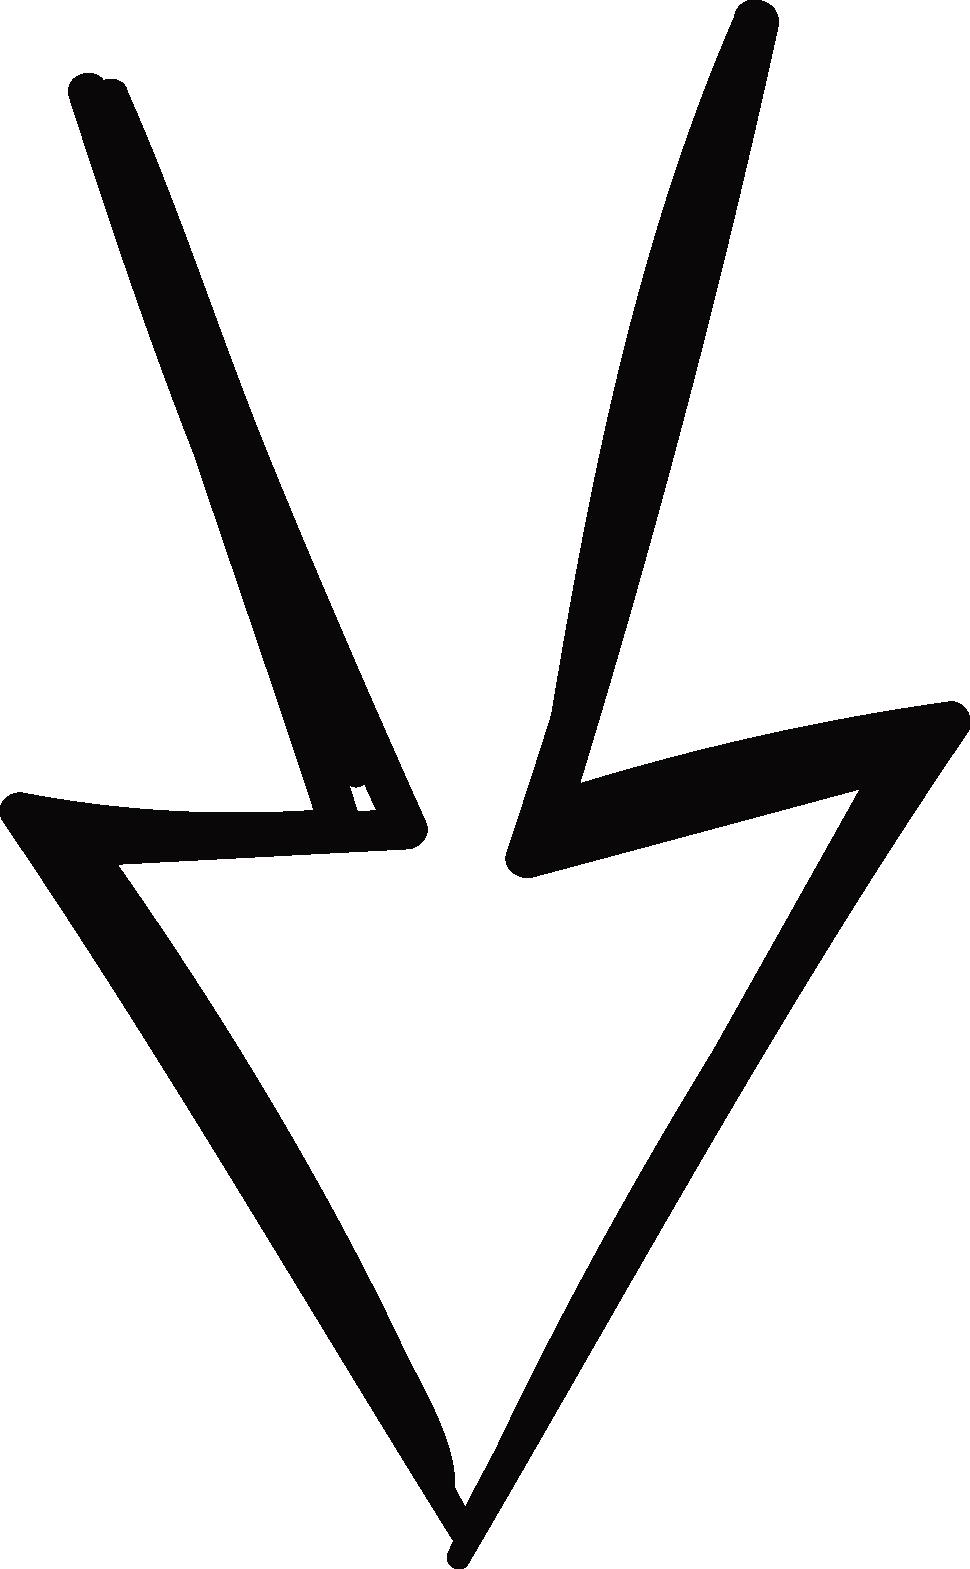 freccia-scorri-in-basso